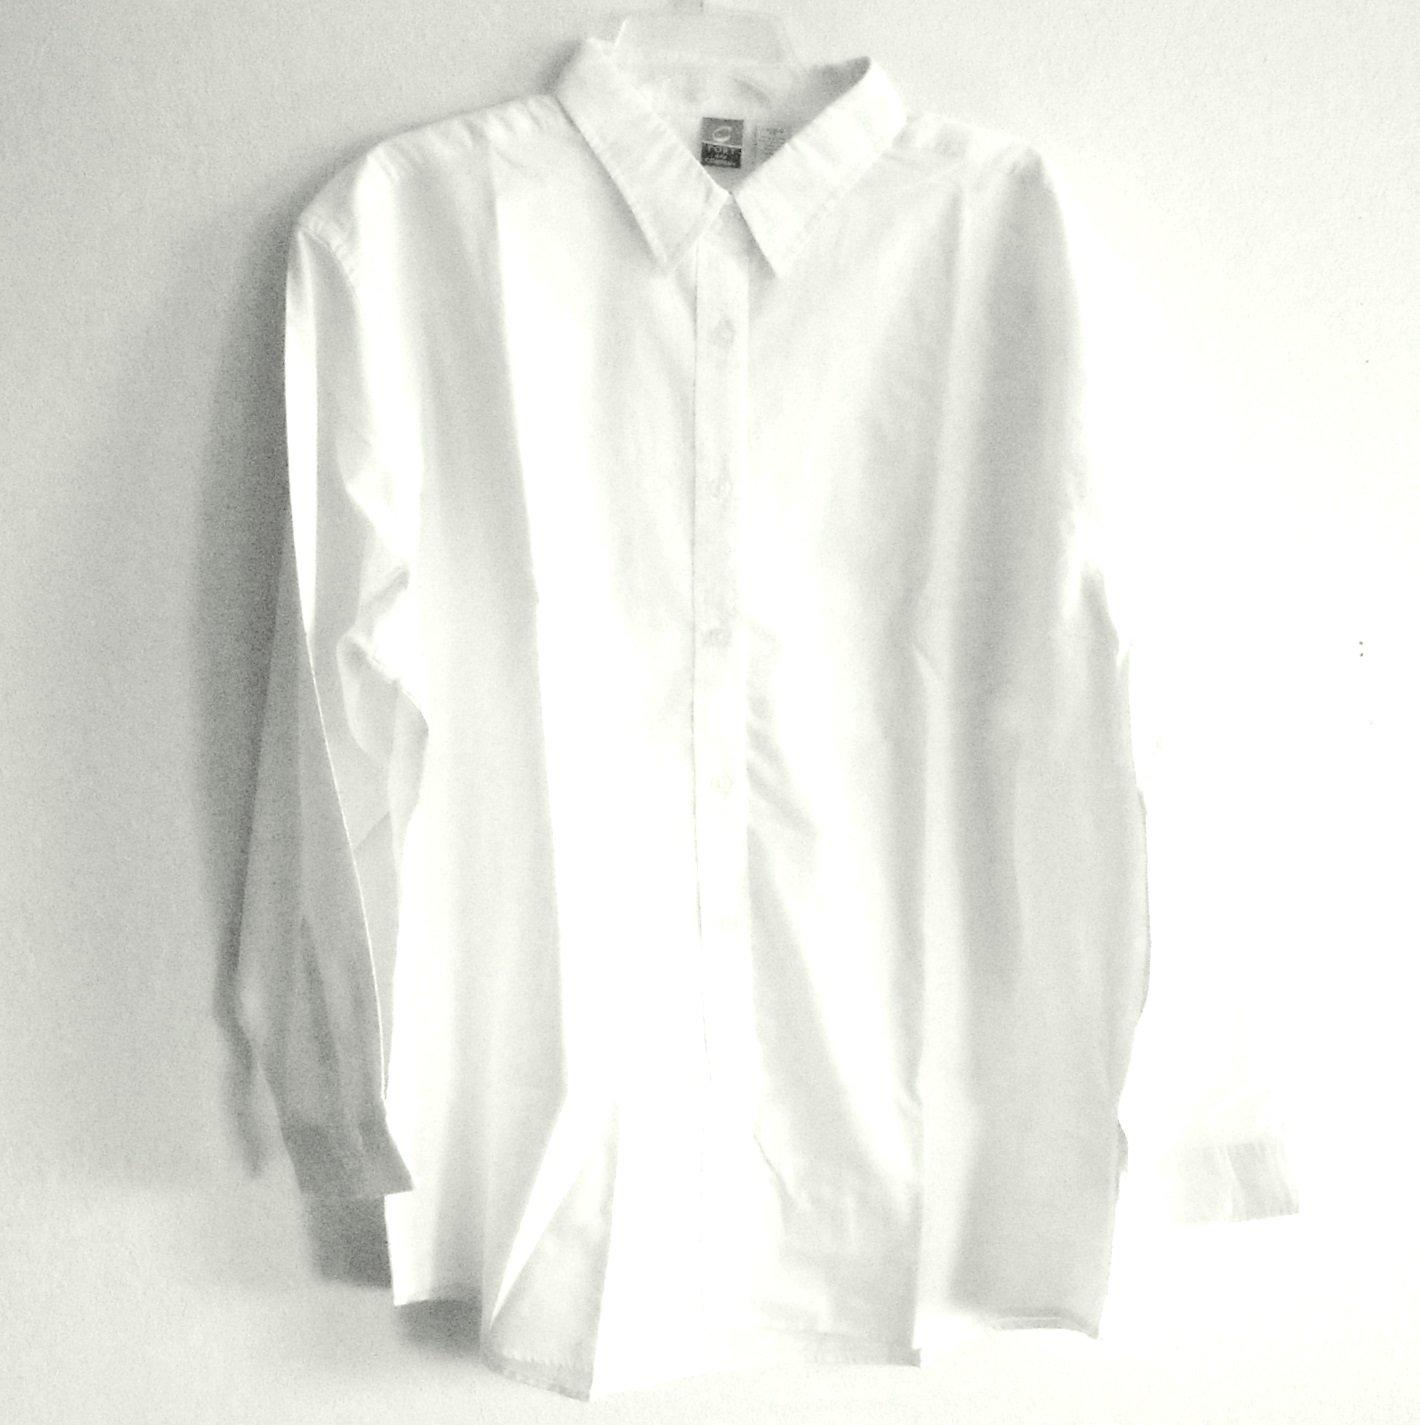 Misses White Denim Oregon Music Festival Country Western Button Up Shirt Top Size XS NIB